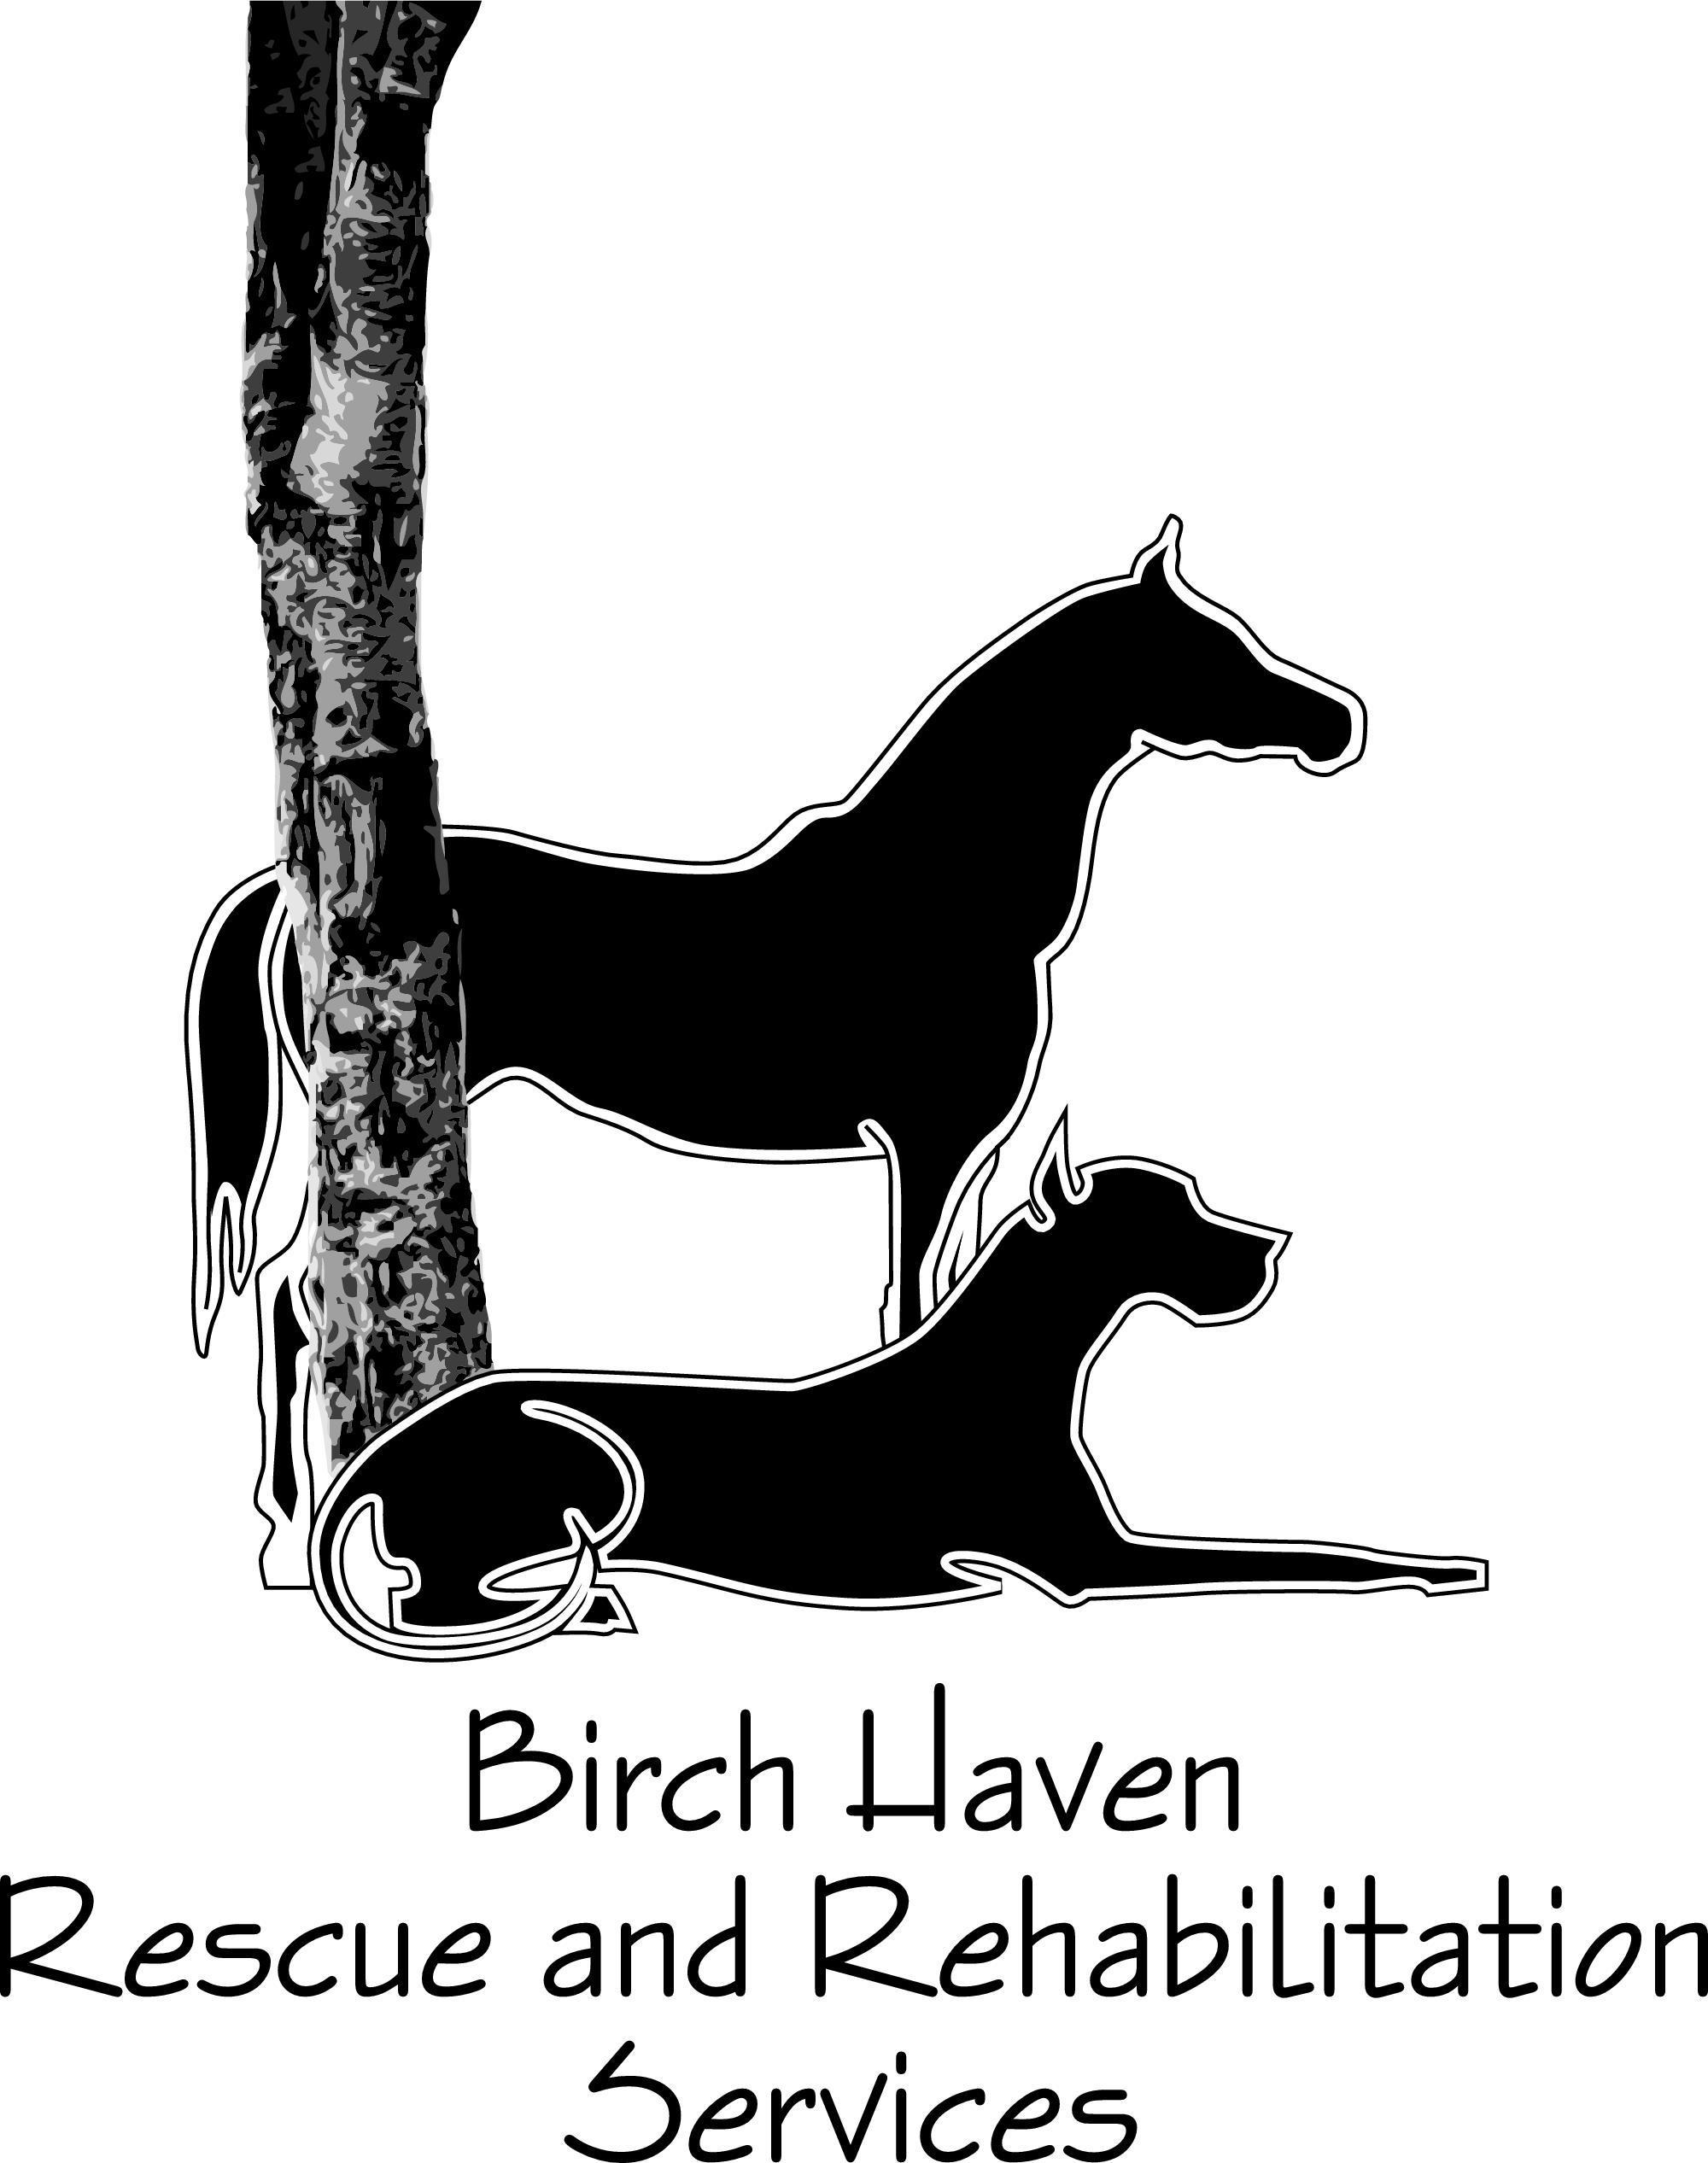 Birch Haven Rescue & Rehabilitation Services